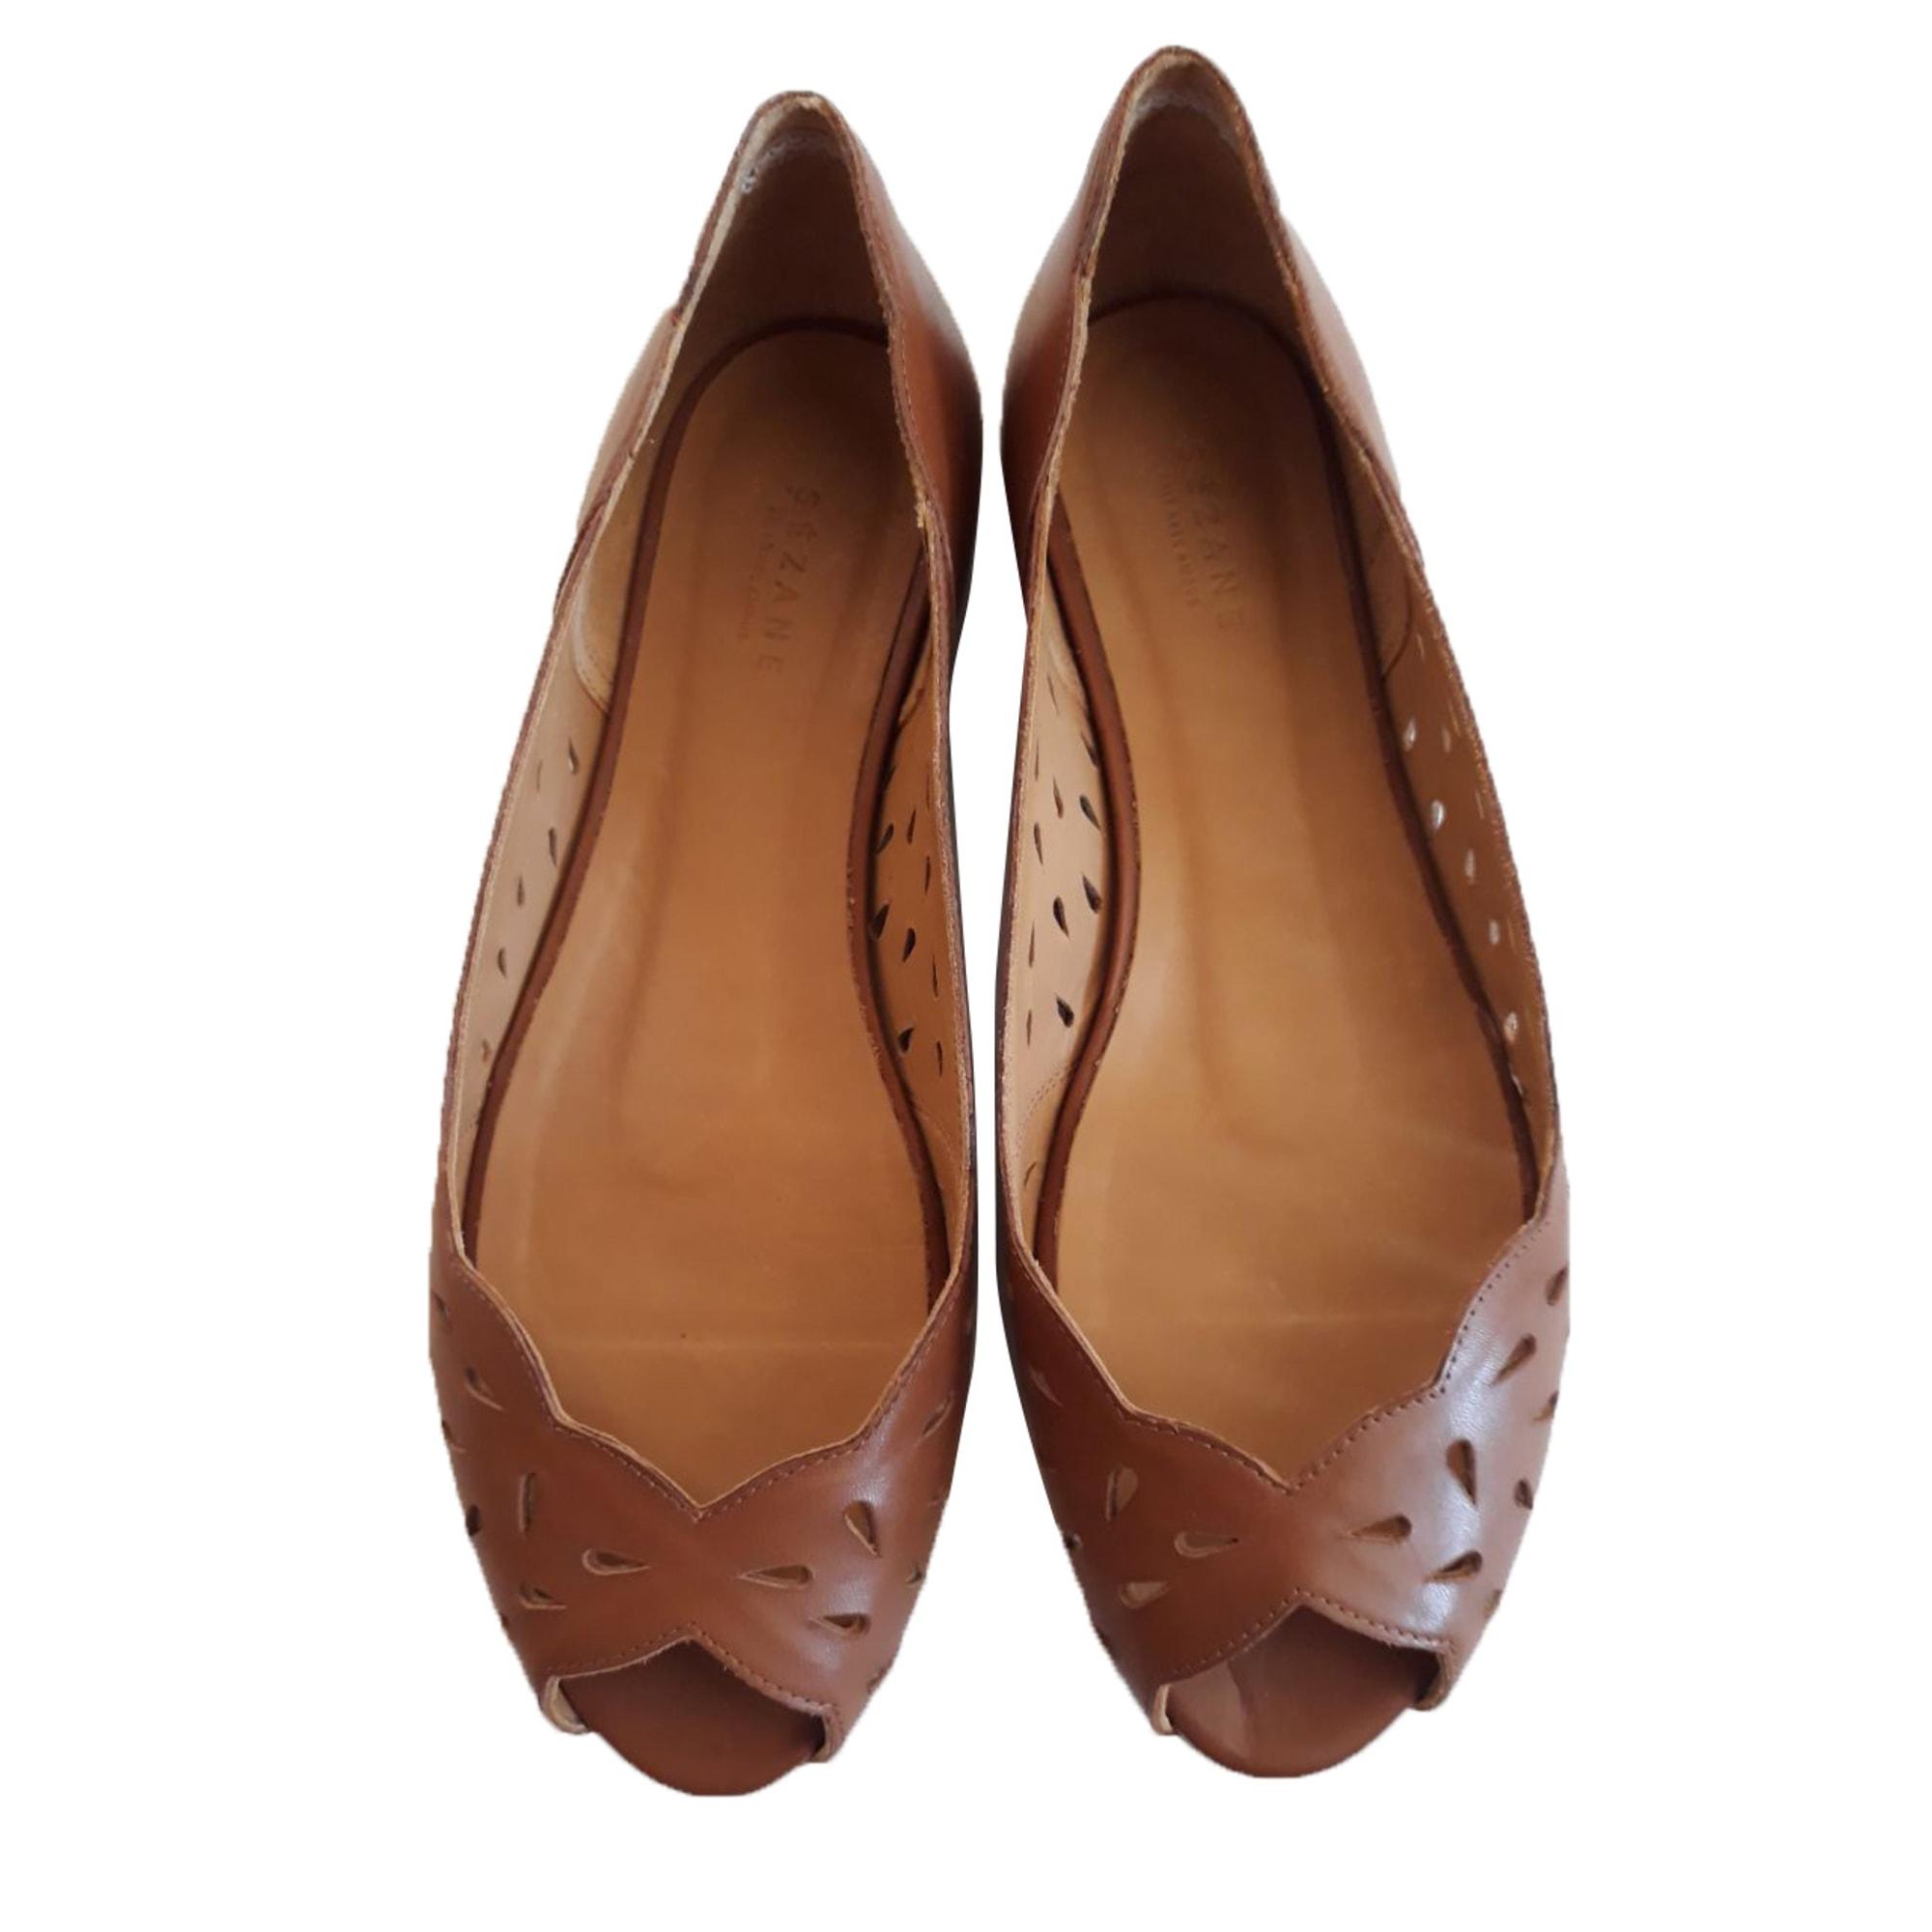 Flat Sandals SÉZANE Beige, camel